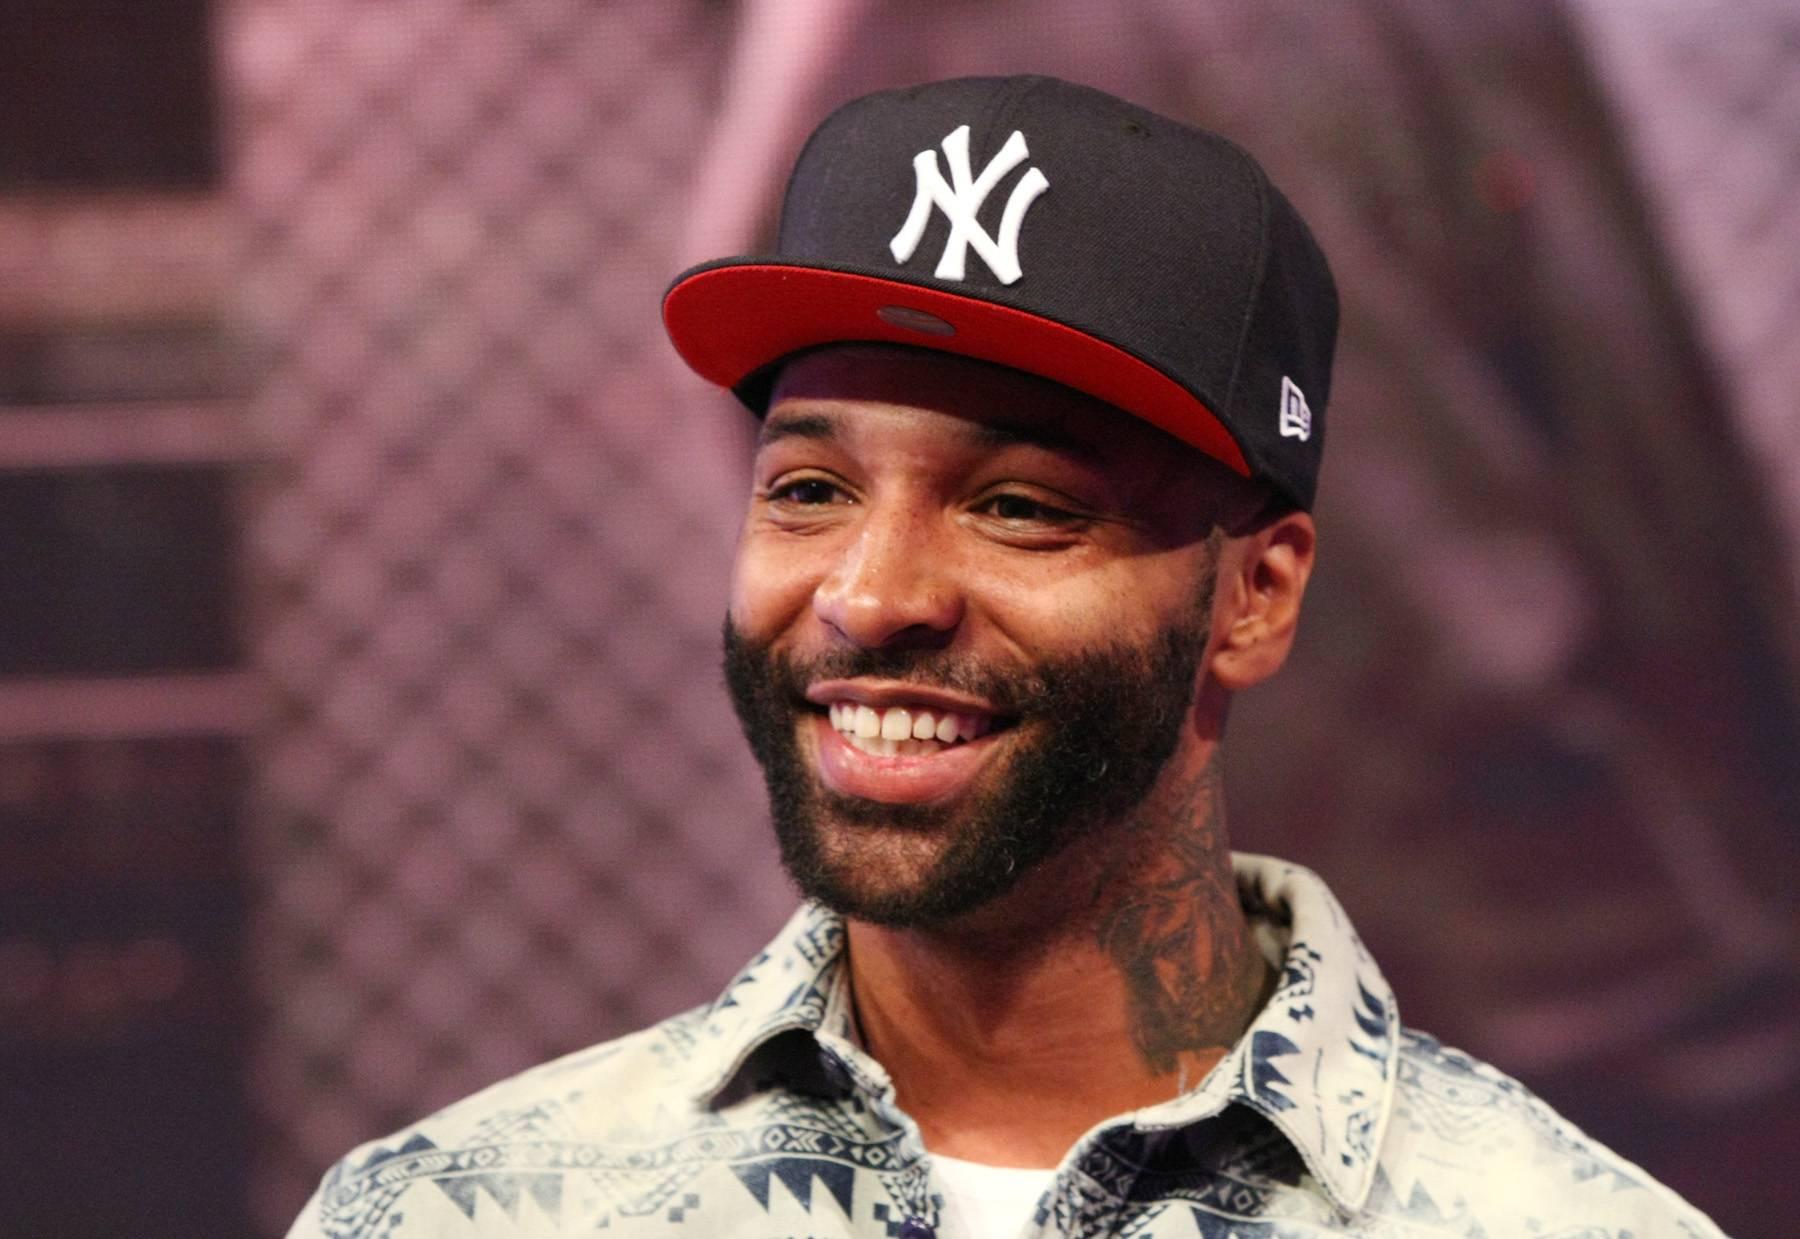 Joe Budden: August 30 - The Love & Hip Hop New York star is still dodging controversy at 34. (Photo: Bennett Raglin/BET/Getty Images)